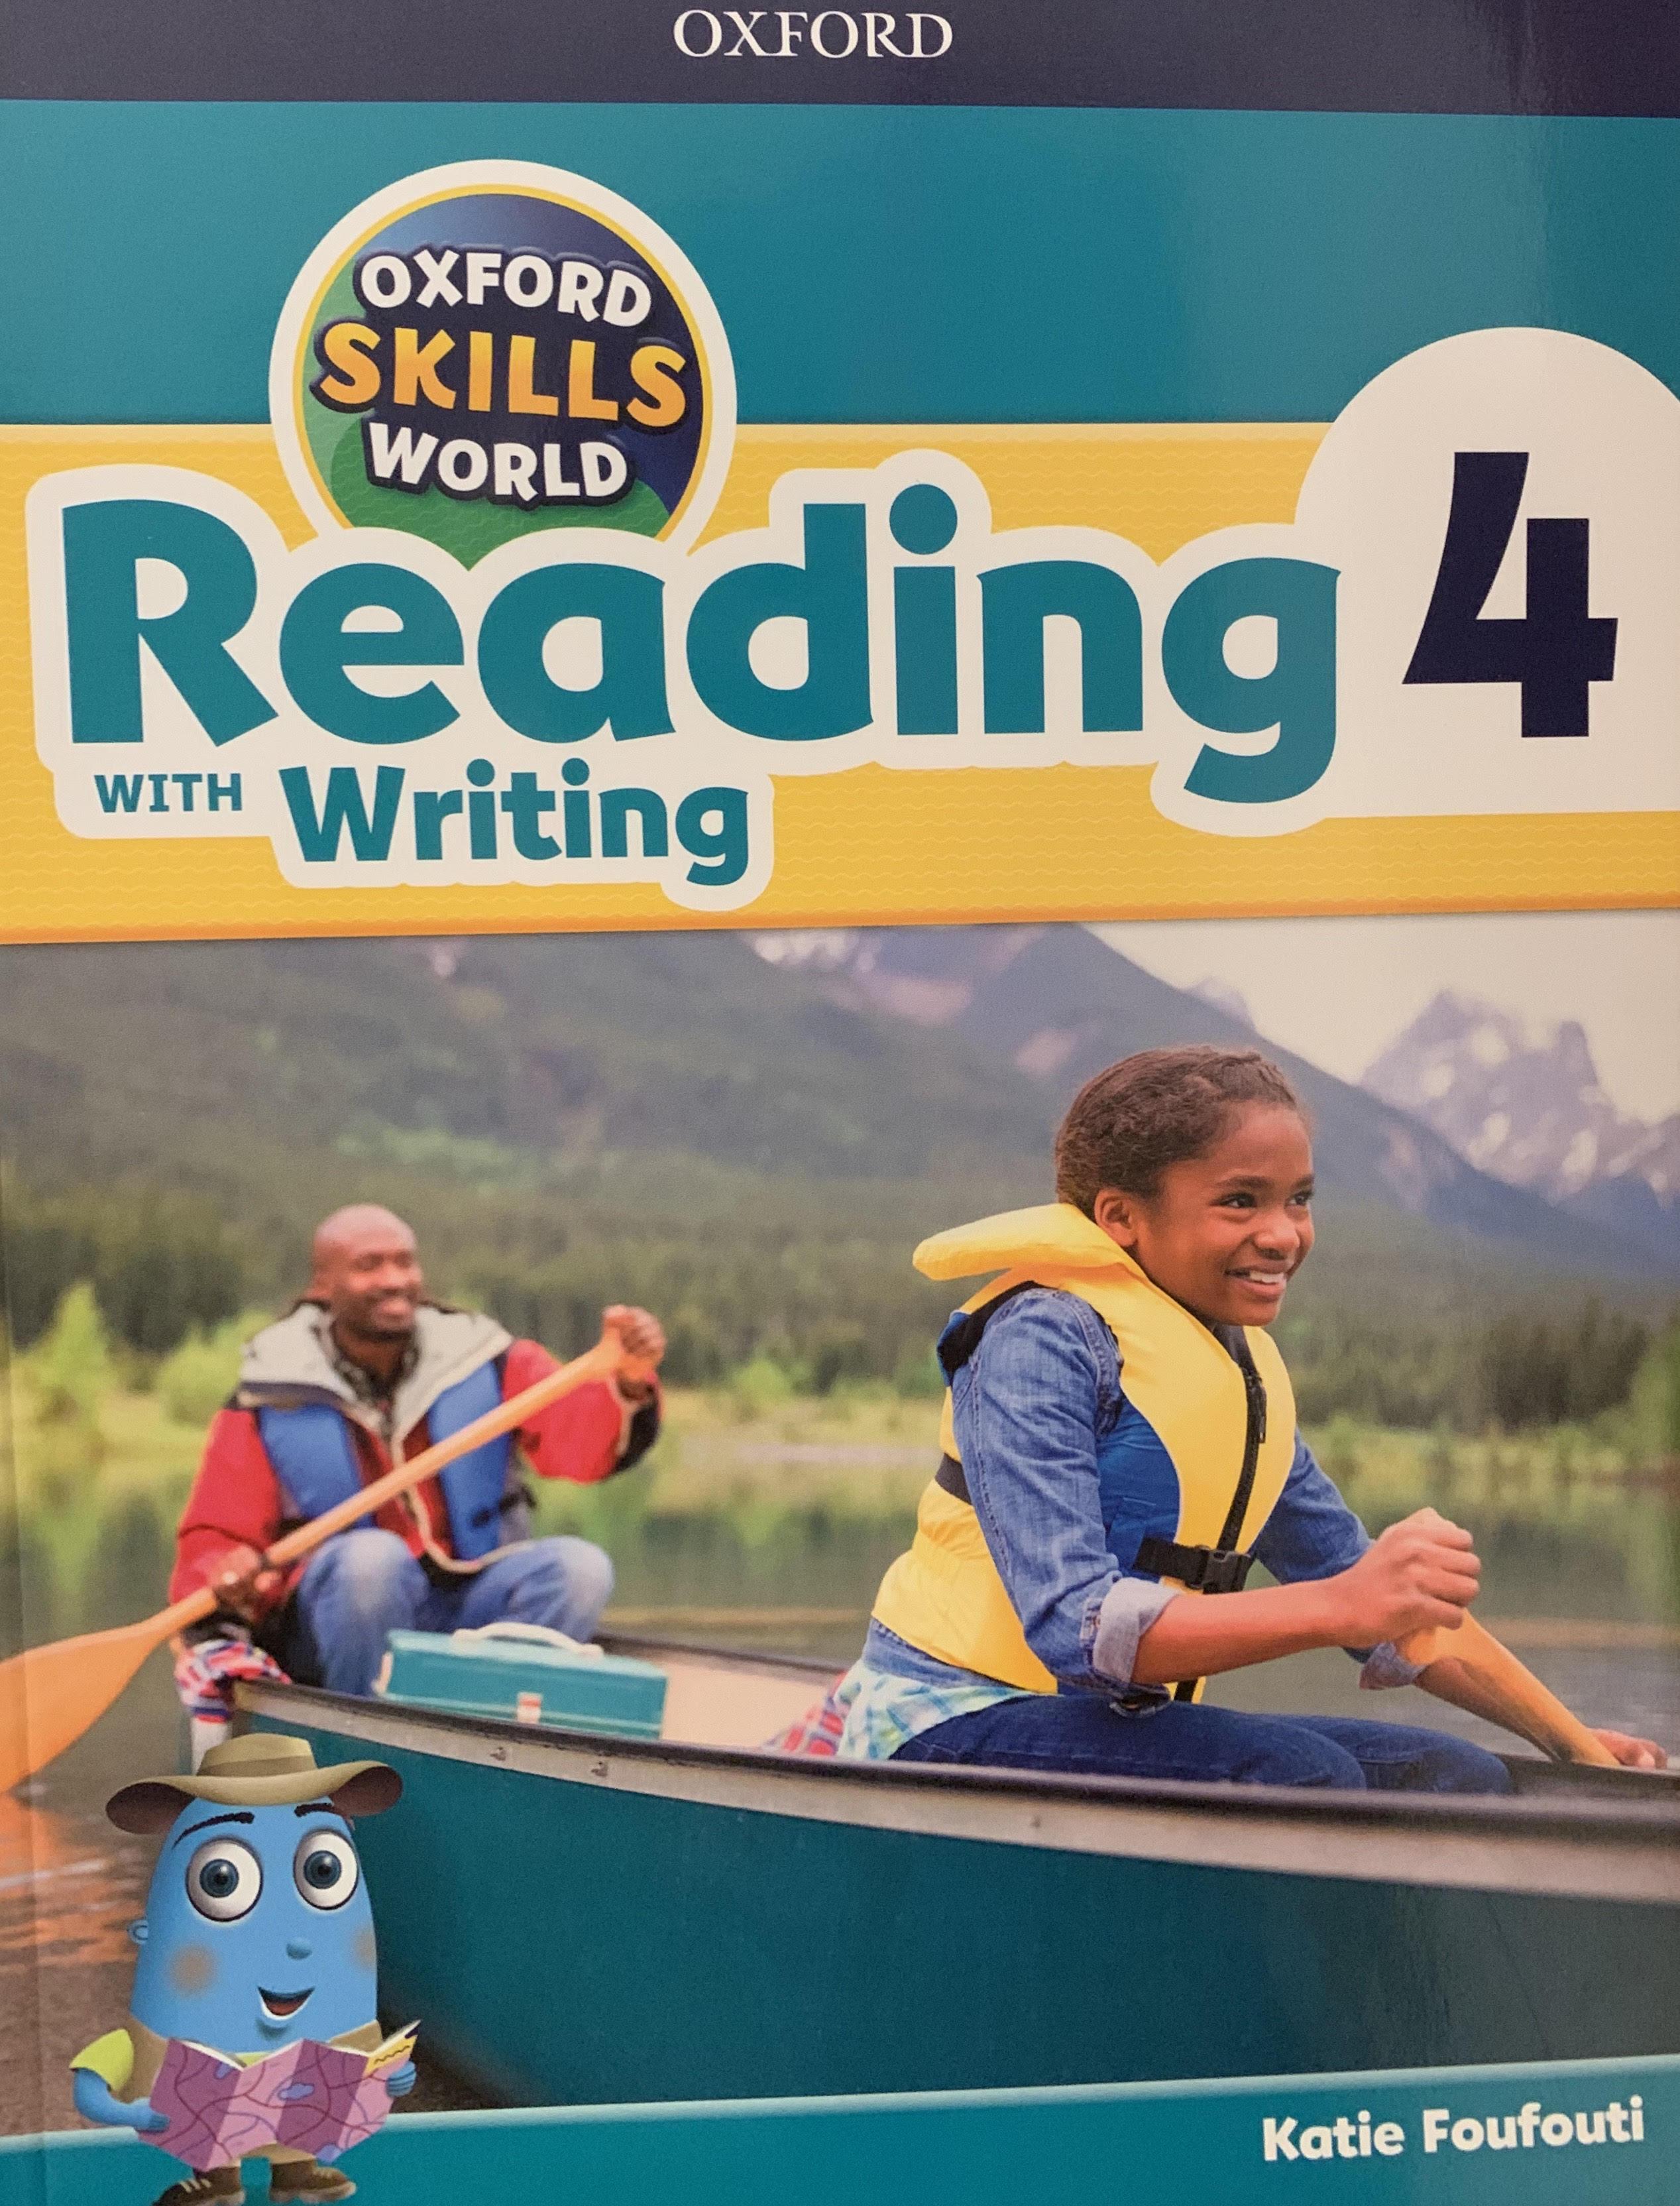 Oxford Skills World Reading Writing 4